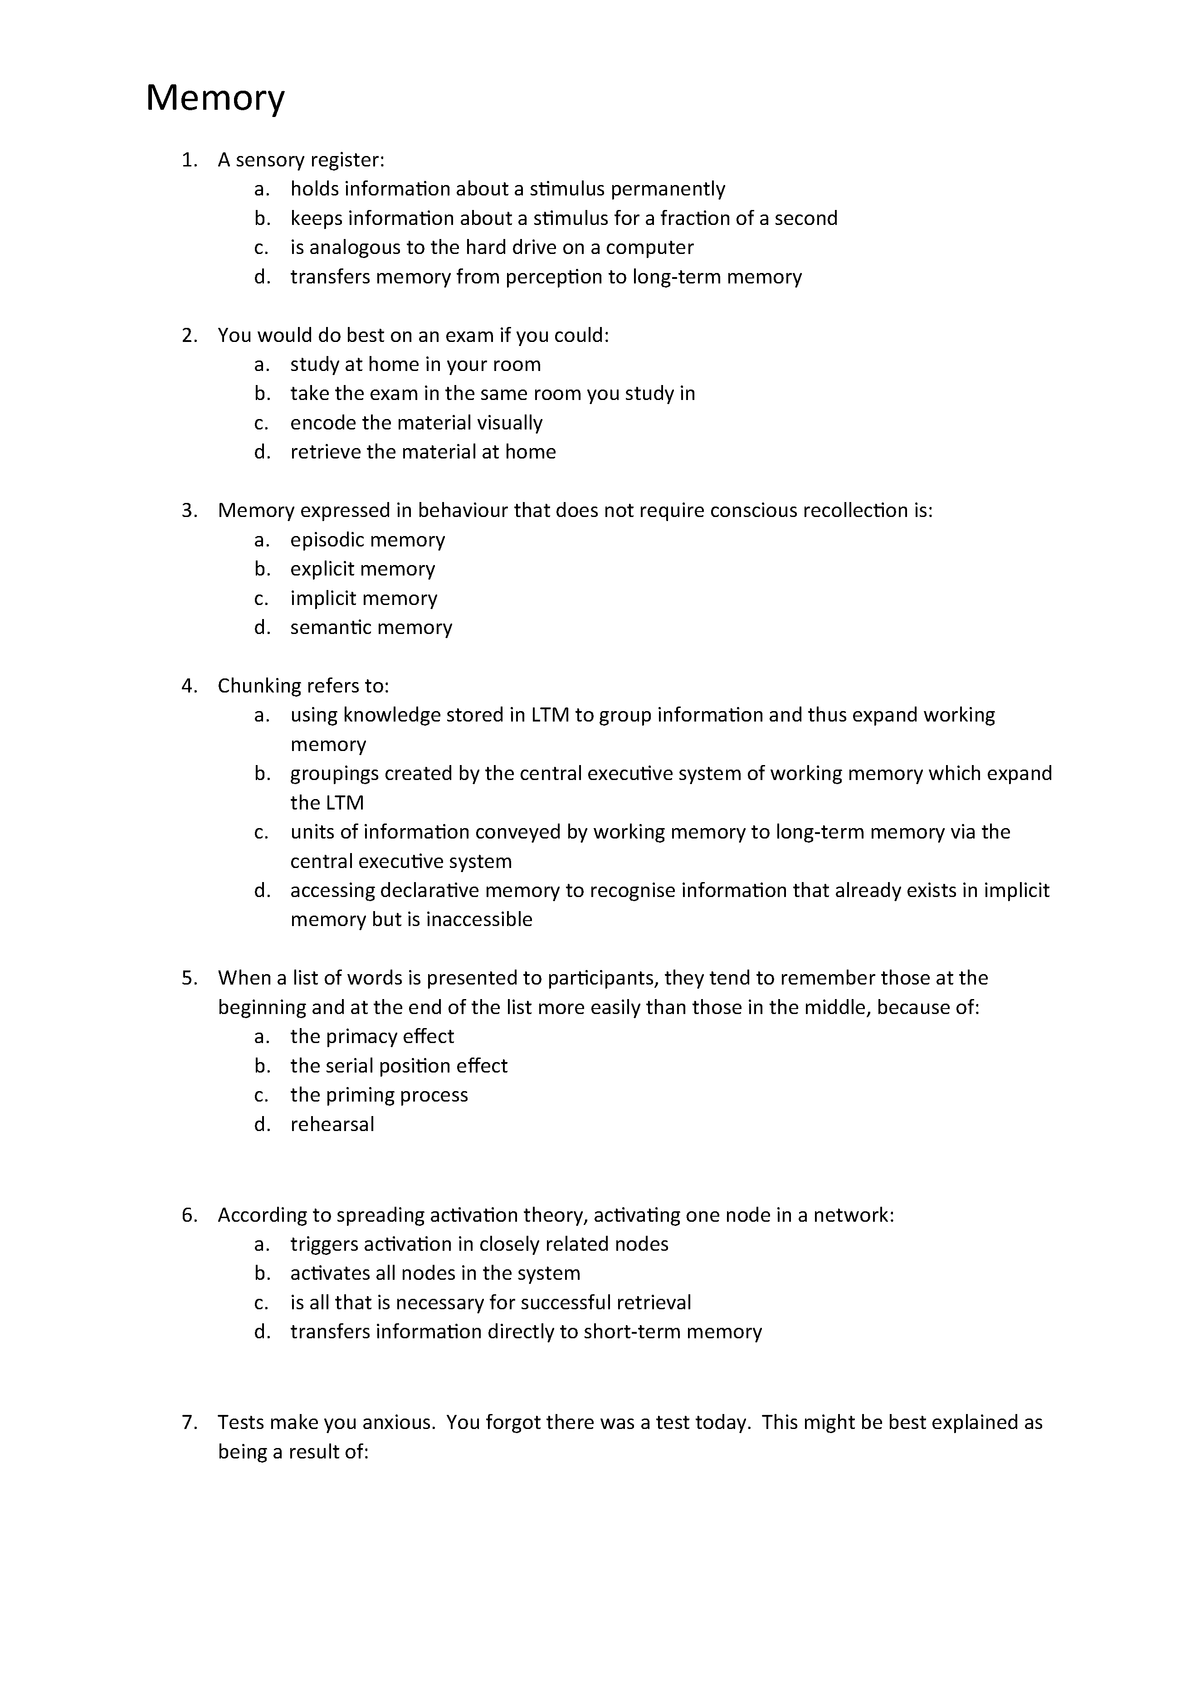 Multiple choice questions: Memory - psy100003: psychology 101 - StuDocu